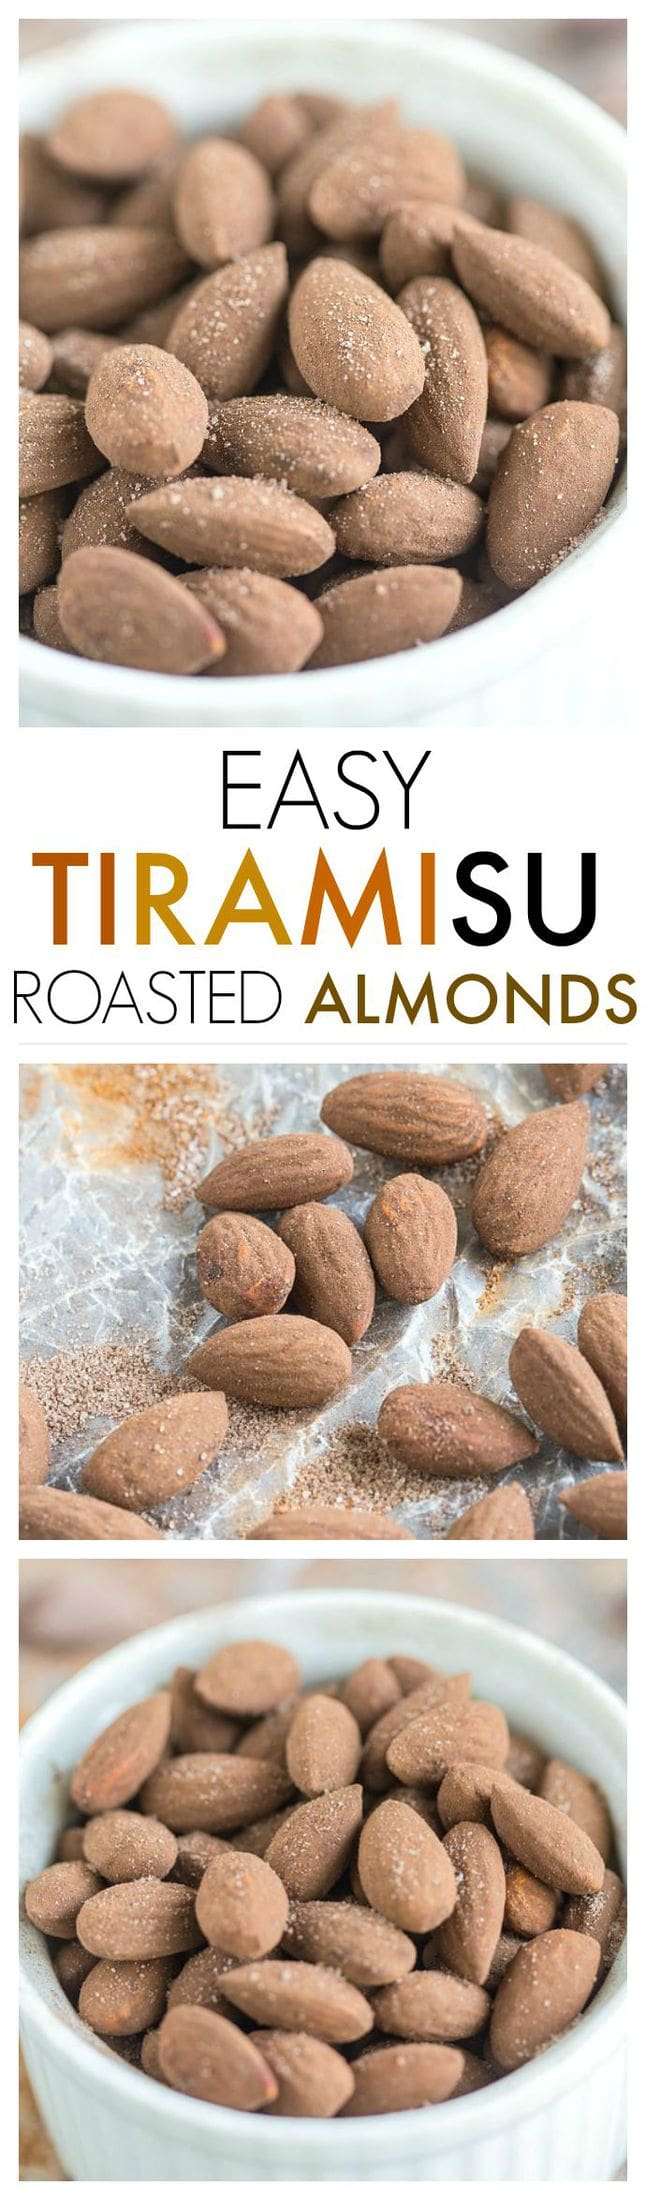 Tiramisu Roasted Almonds- Quick, easy and so darn delicious, you'd never guess these tiramisu roasted almonds were healthy too! {gluten free, vegan, paleo + sugar free option!} #coffee #tiramisu #almonds